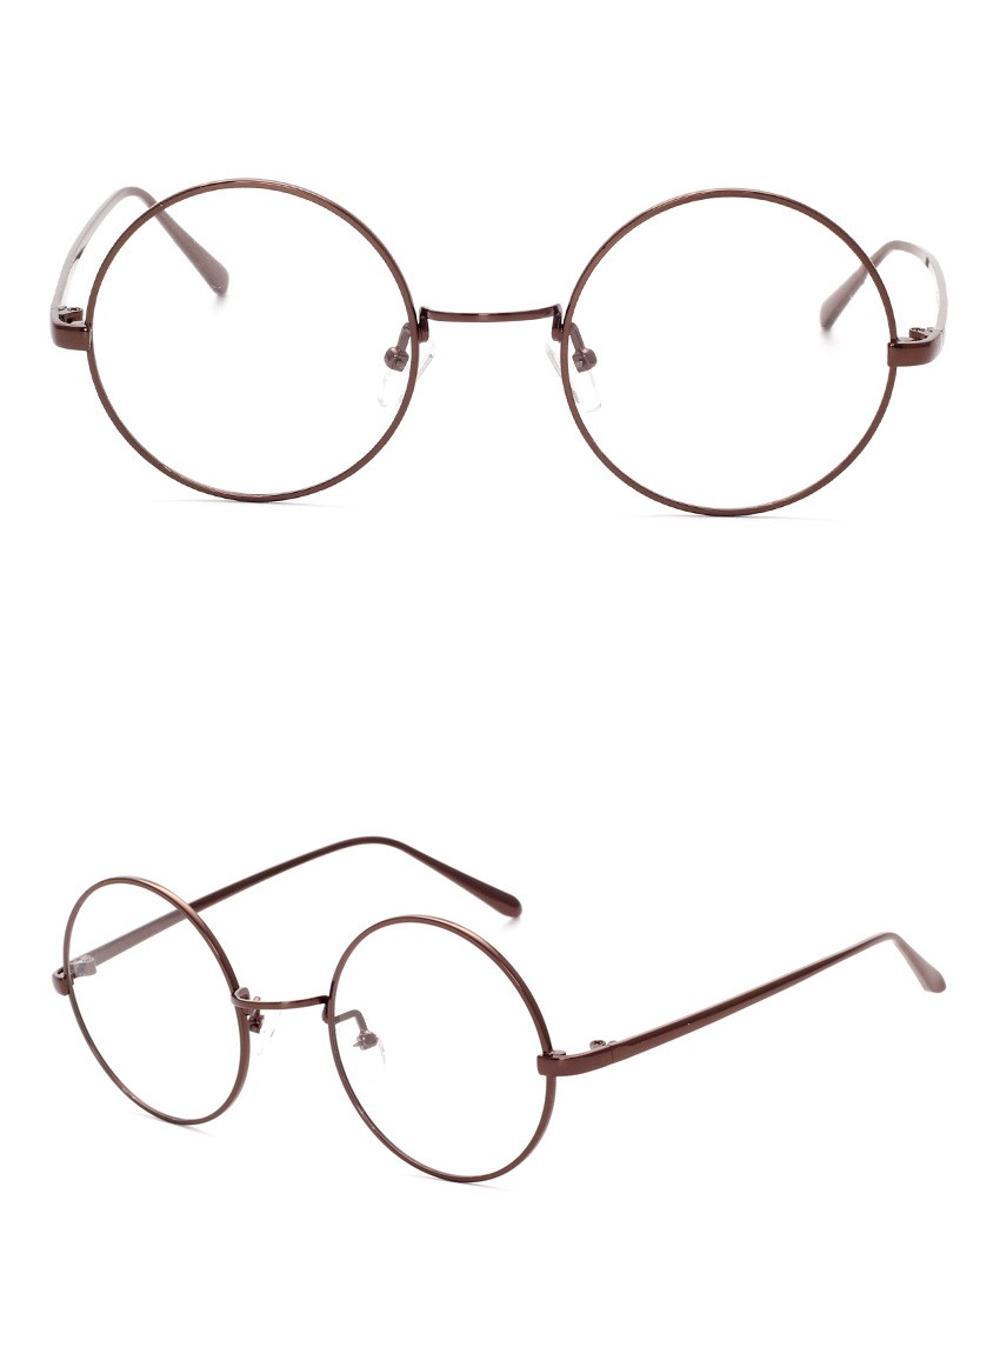 109f8a0bdf 2018 new full rim gold cheap metal frame glasses eyewear frame china nerd  men thin fashion